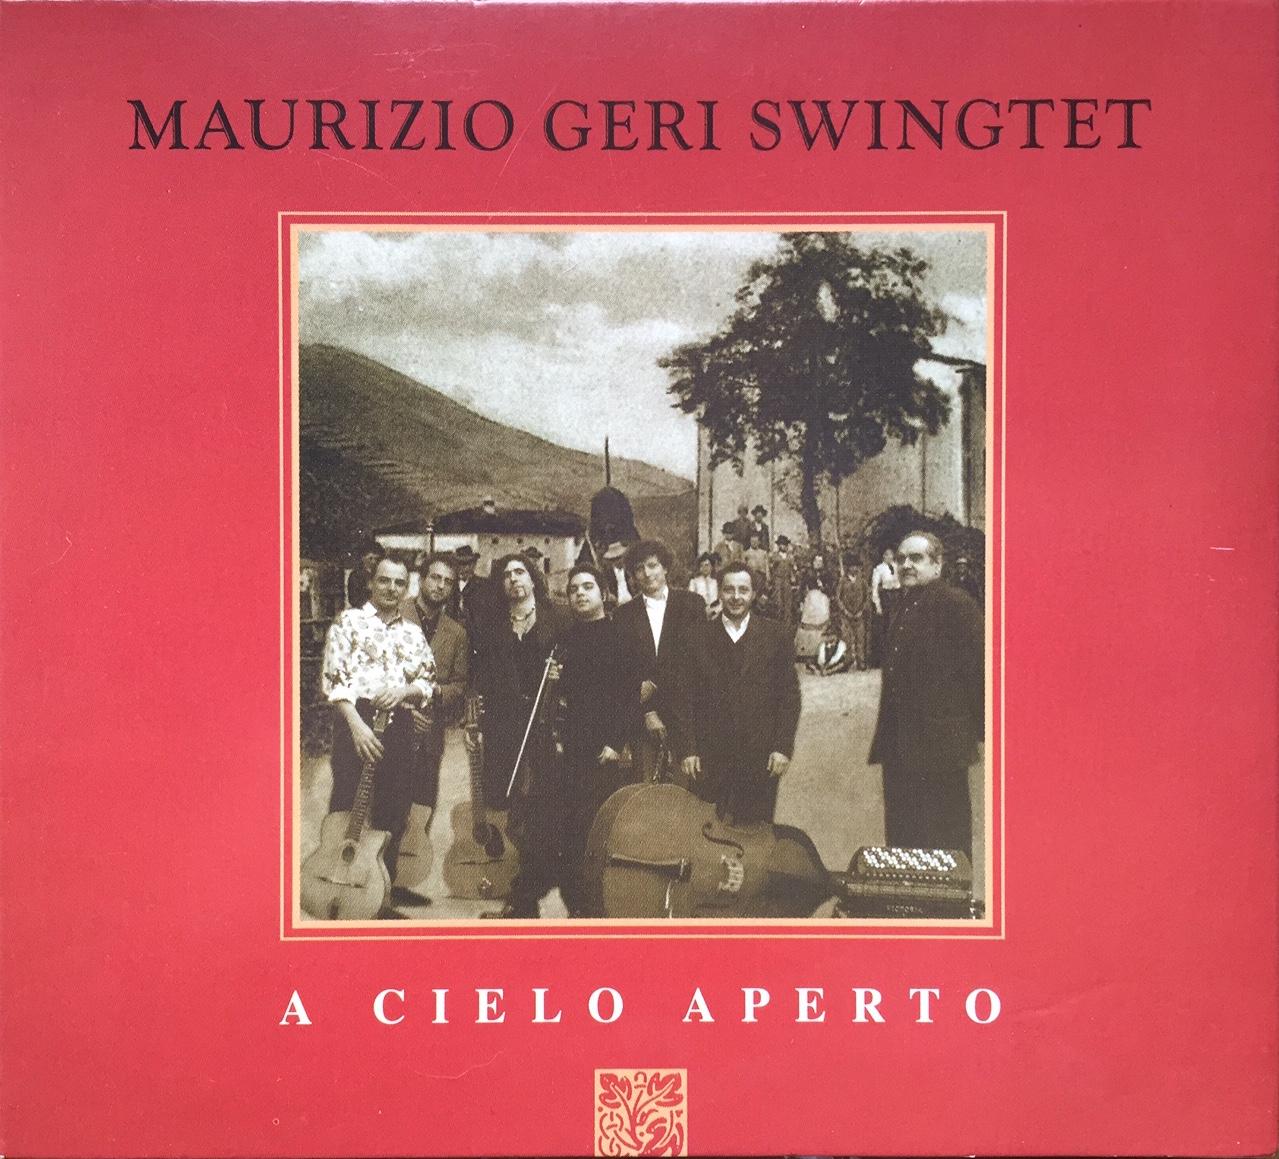 Maurizio Geri Swingtet – A cielo aperto